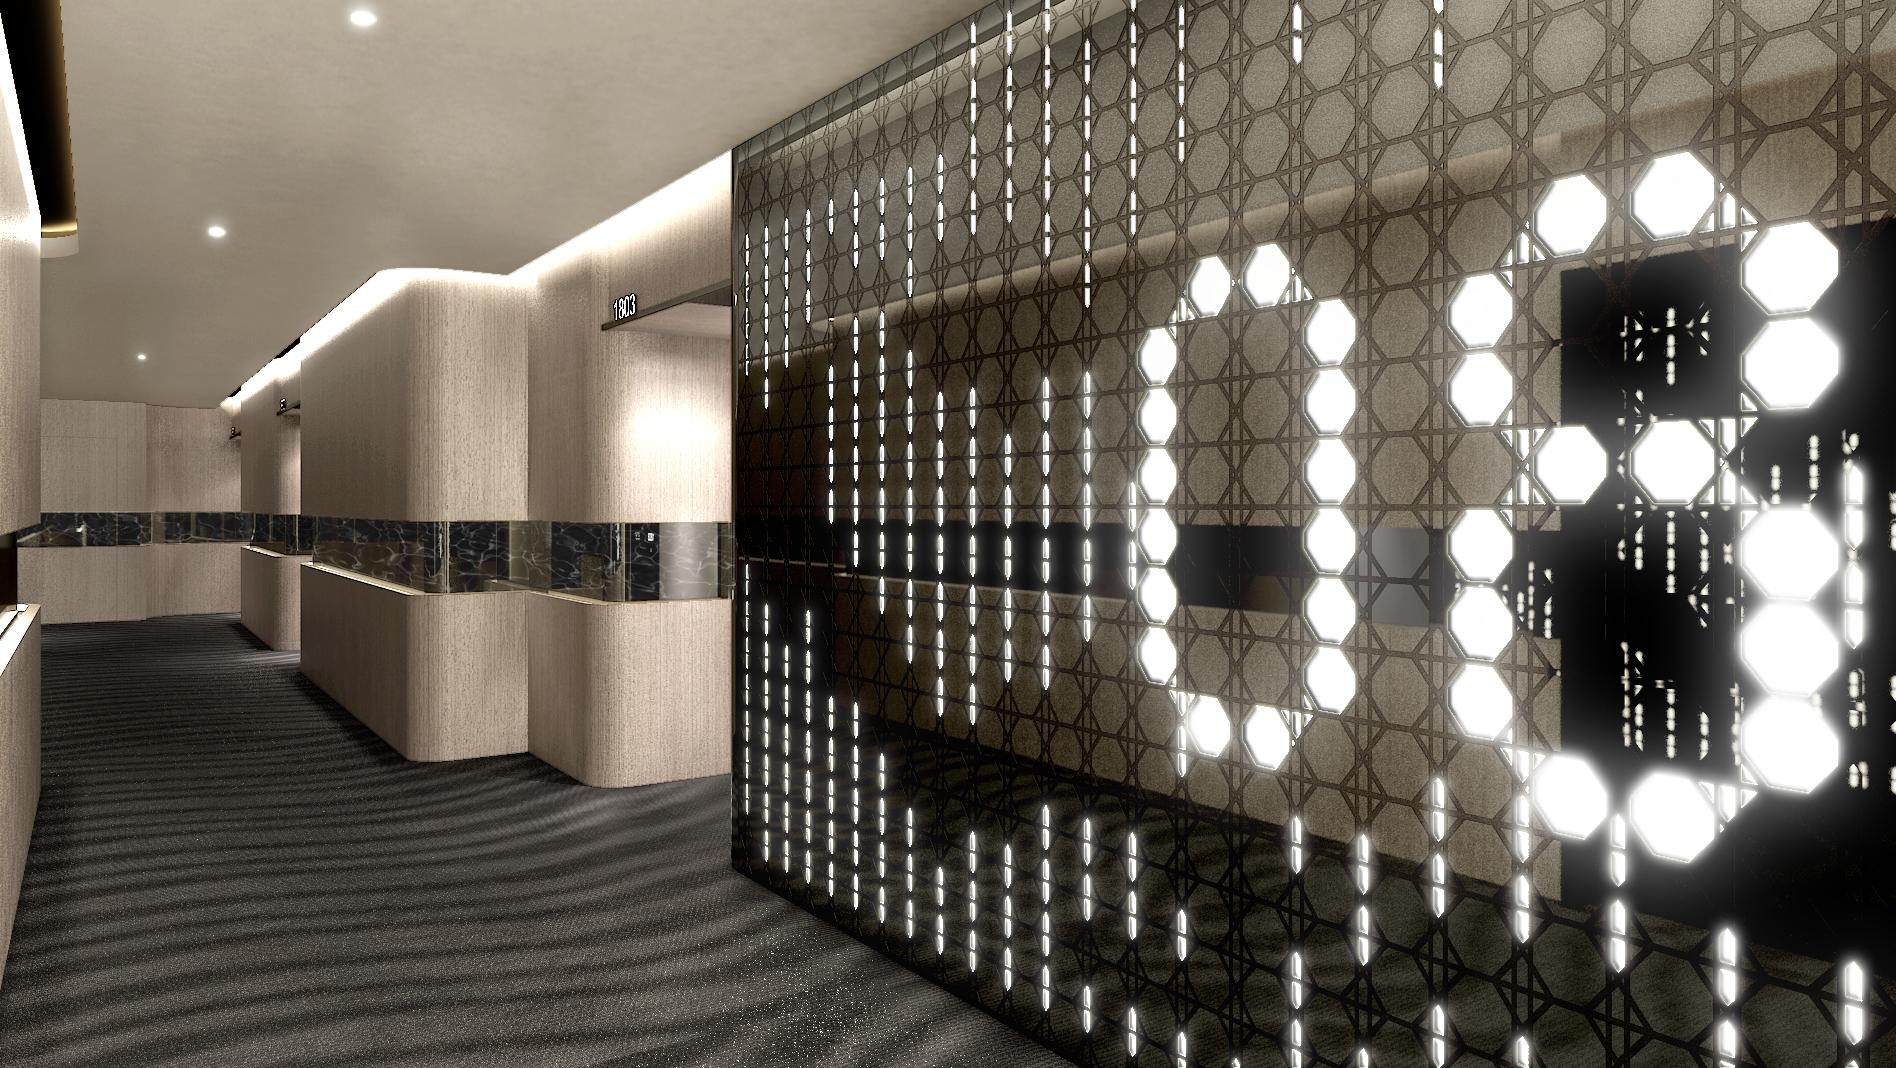 Corridor1  20141114.jpg